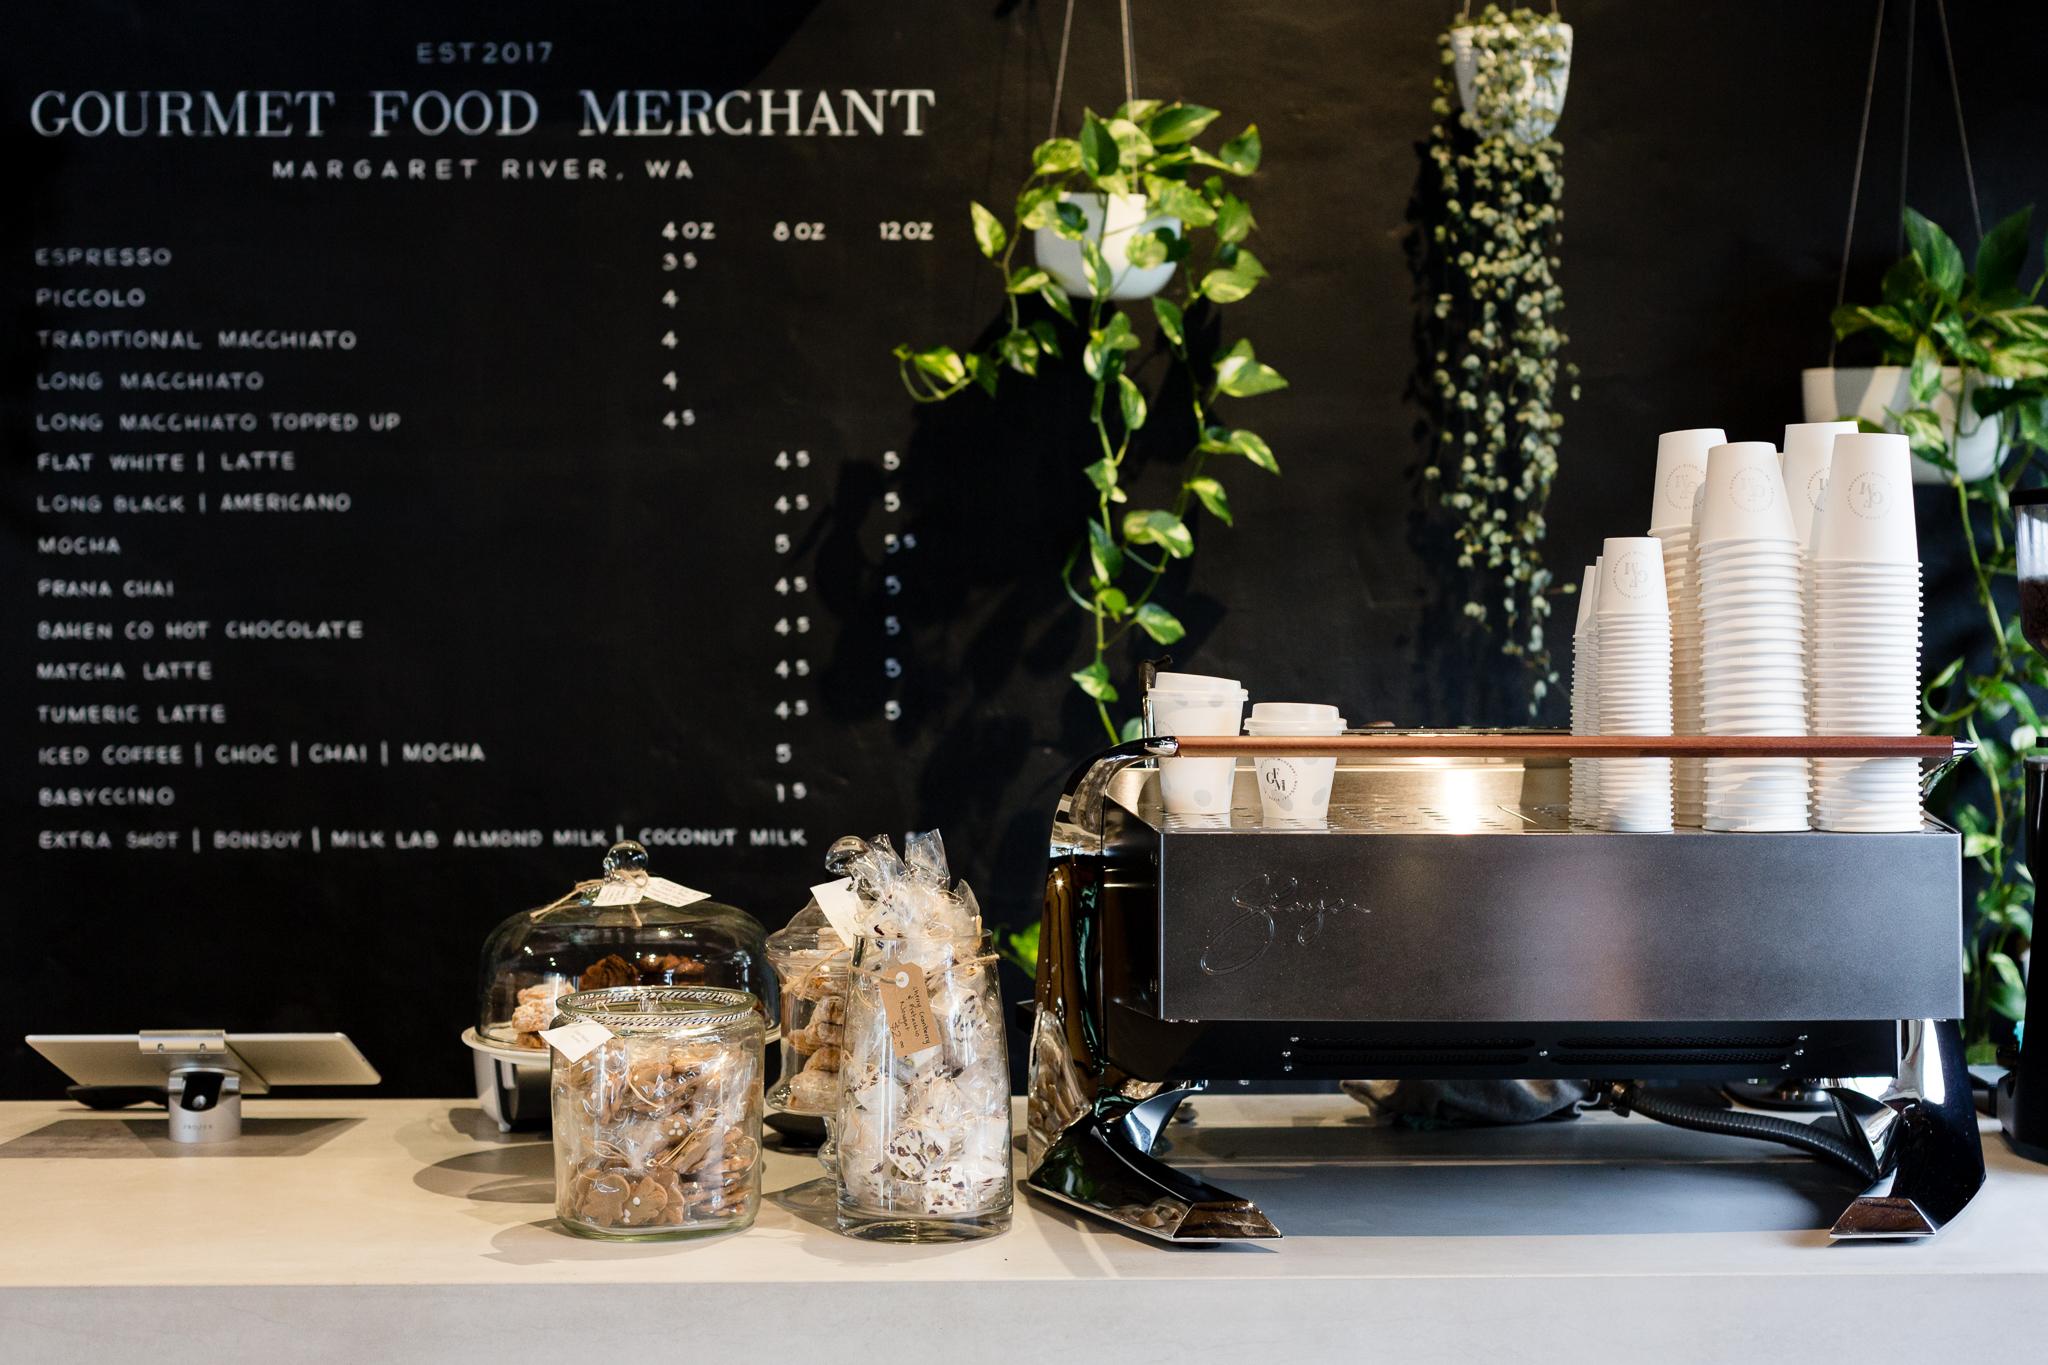 JAG_06-20 Gourmet Food Merchant_002_w.jpg